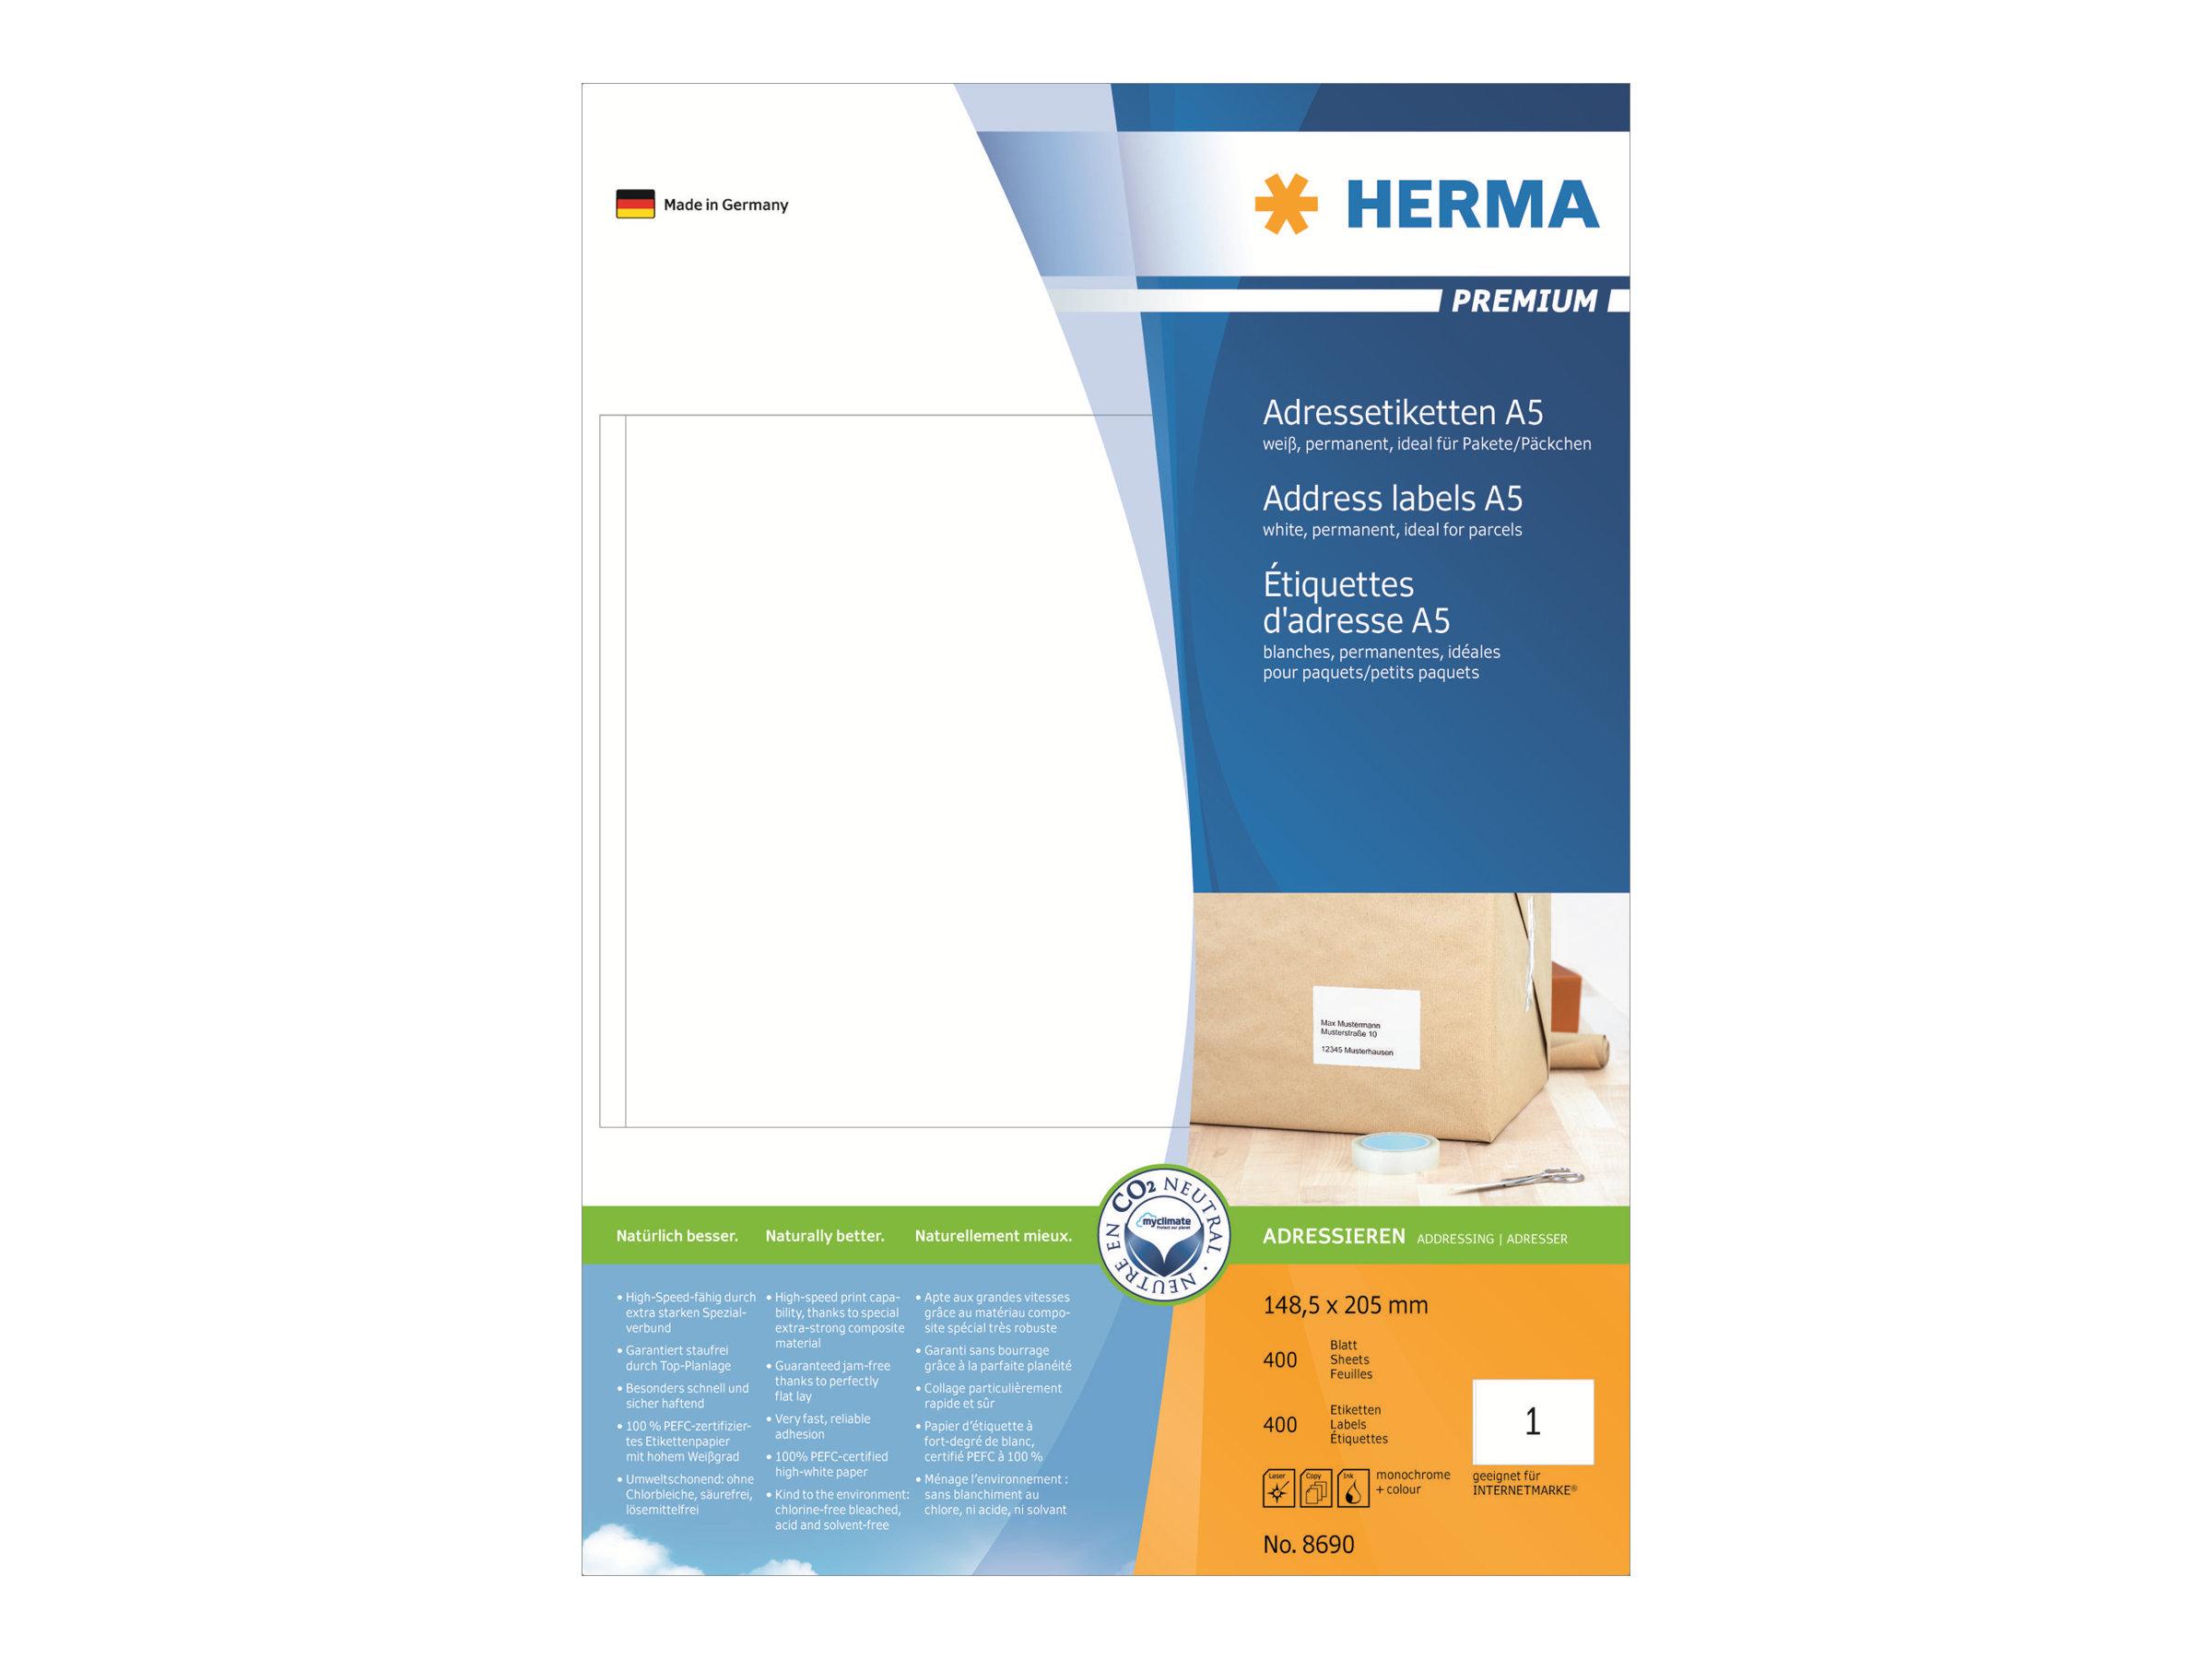 HERMA Premium - Papier - matt - permanent selbstklebend